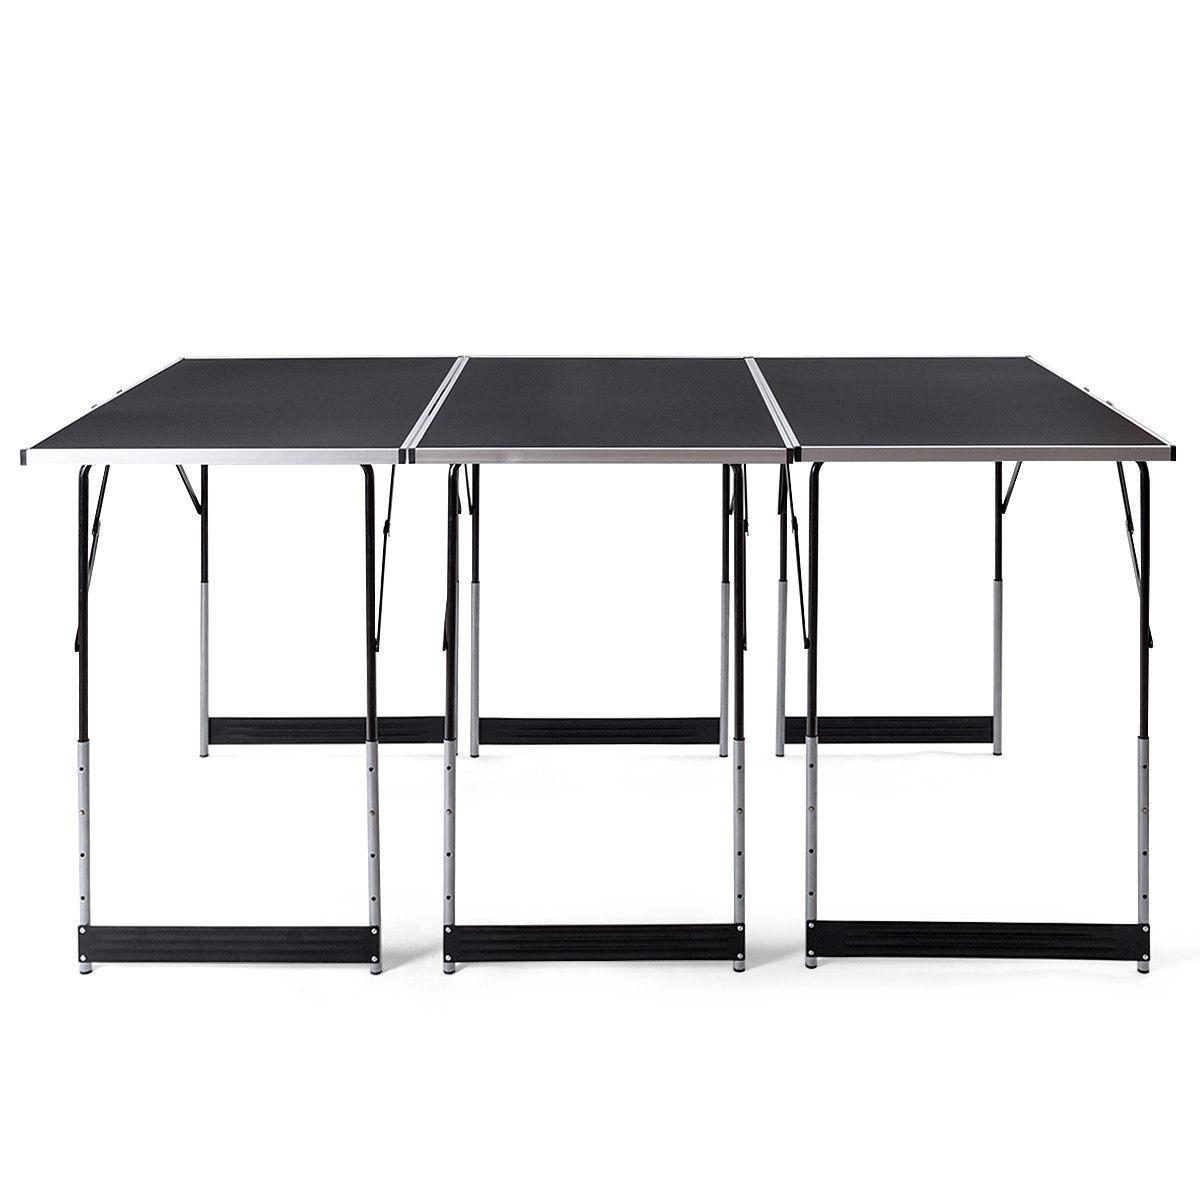 3 pcs Folding Height Adjustable Camping Picnic Table Set